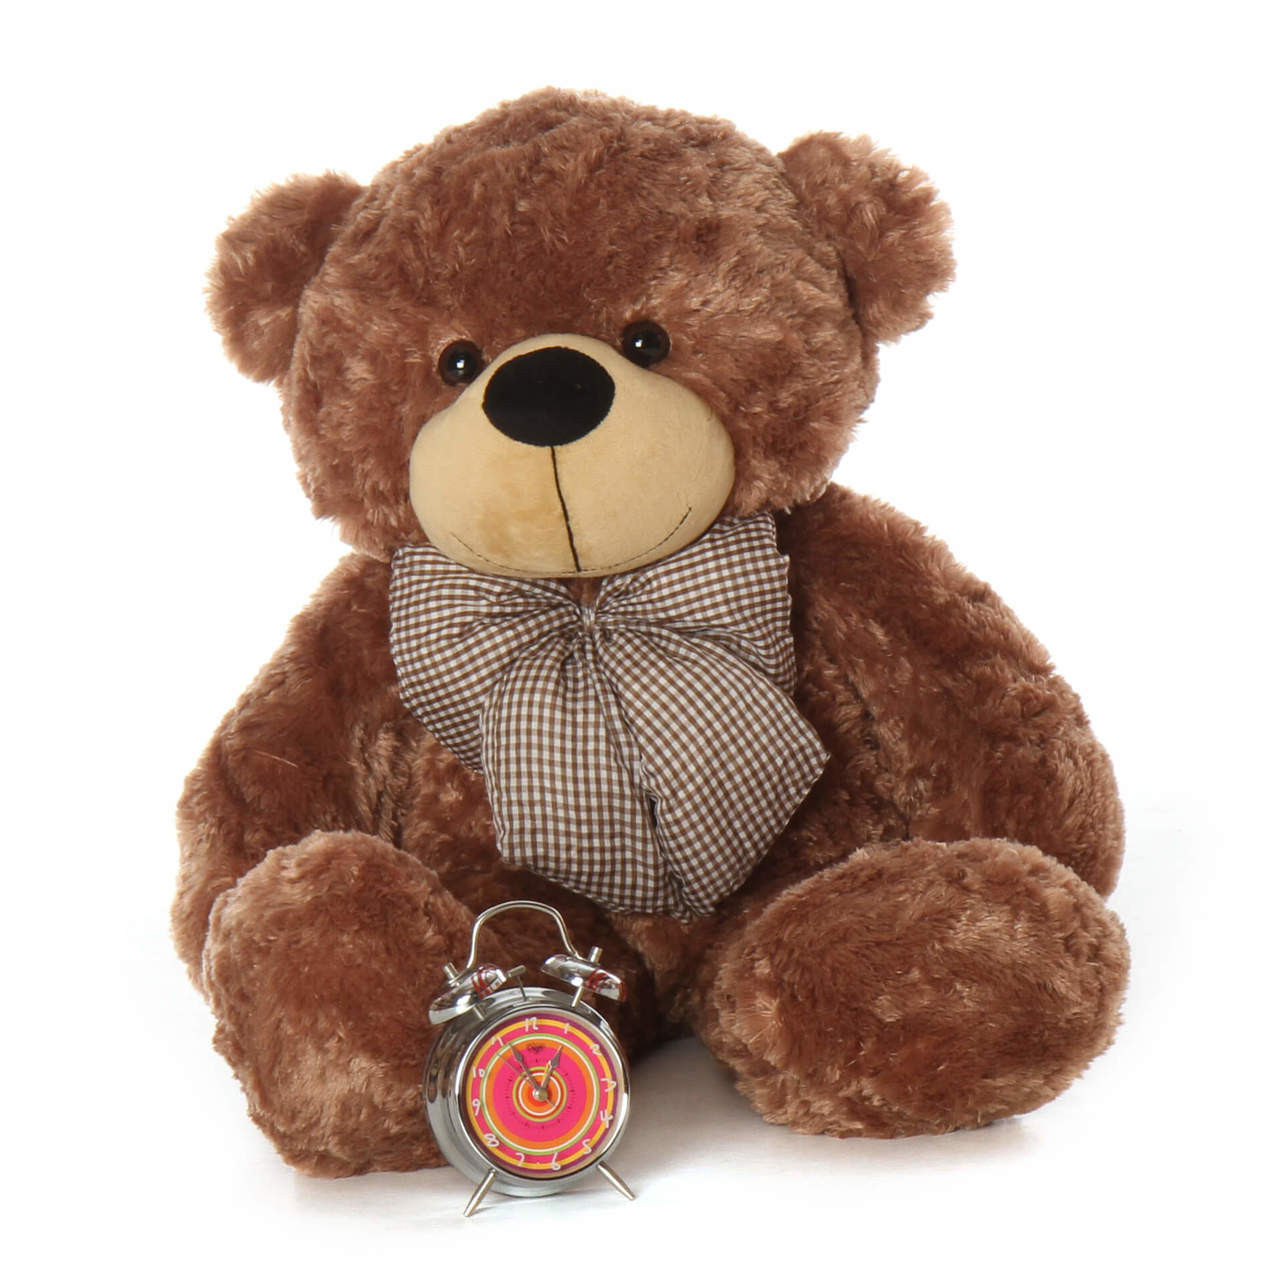 Over 3ft Huge Teddy Bear Snuggly Soft Mocha Brown Fur Sunny Cuddles gift of a lifetime